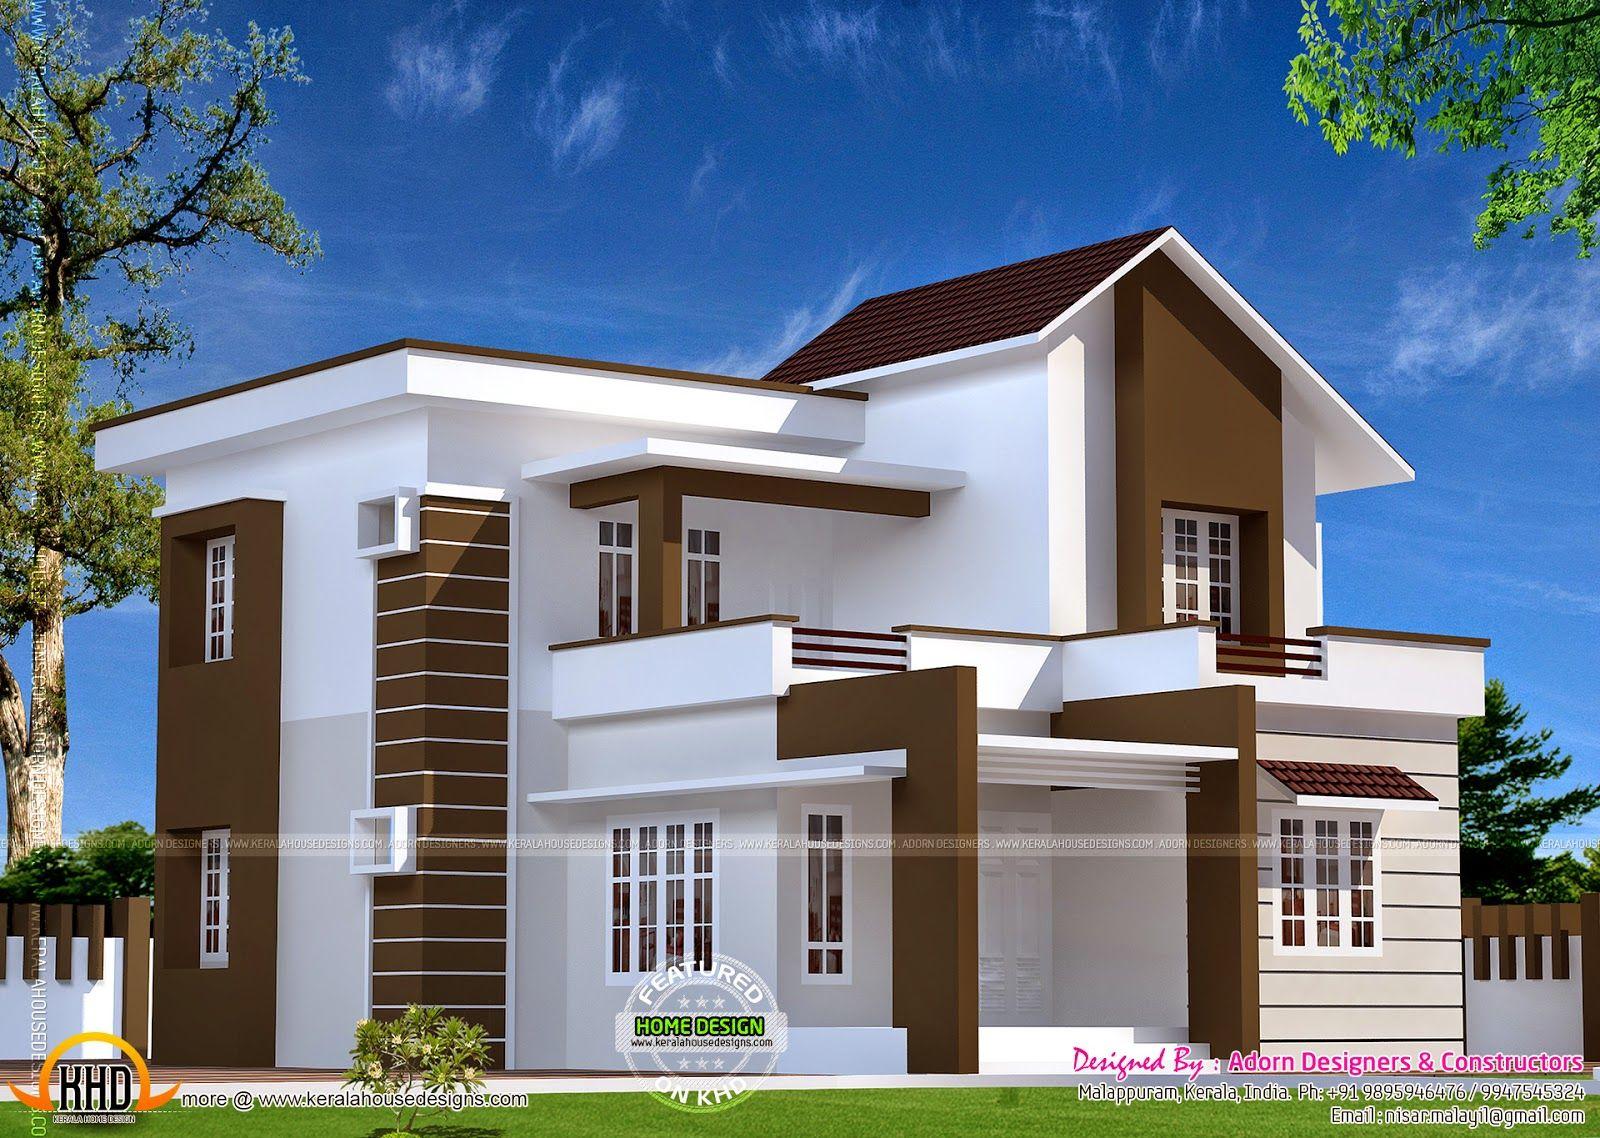 Double Storied Home Kerala Kerala Home Design Floor Plans Kerala Home Plan Elevation Sq Ft Home Ap House Front Design Kerala House Design Bungalow House Design